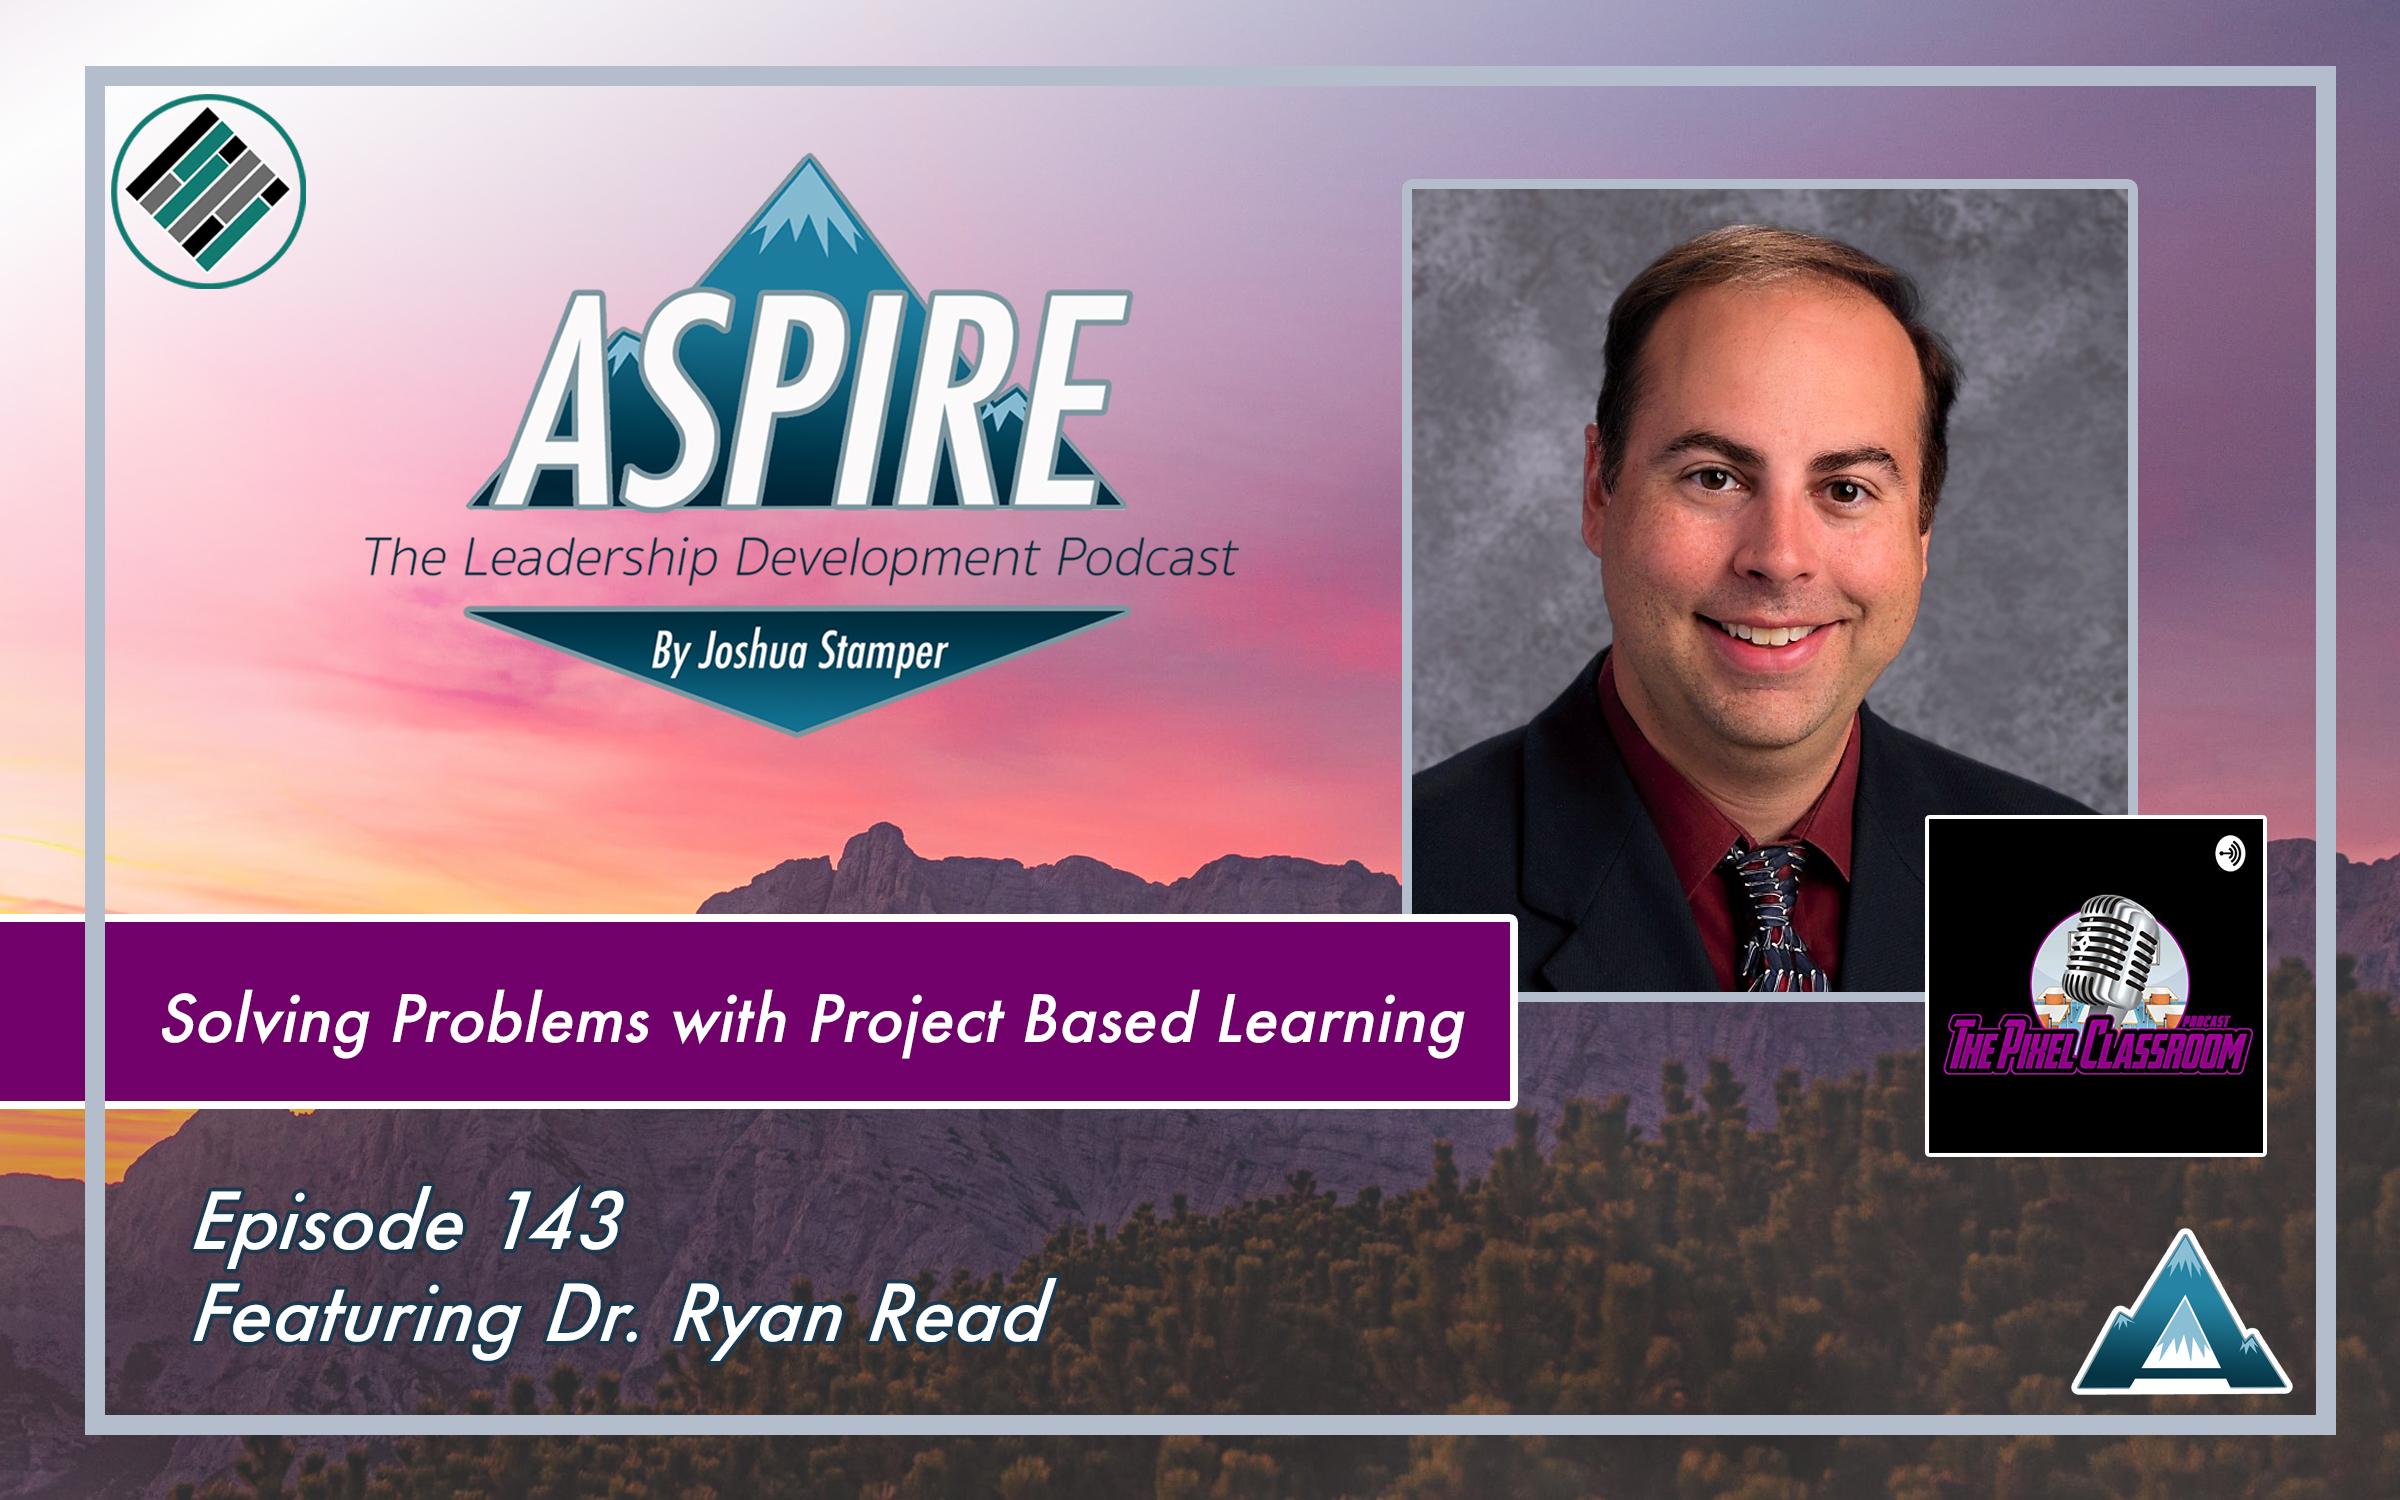 Joshua Stamper, Dr. Ryan Read, Aspire: The Leadership Development Podcast, #AspireLead